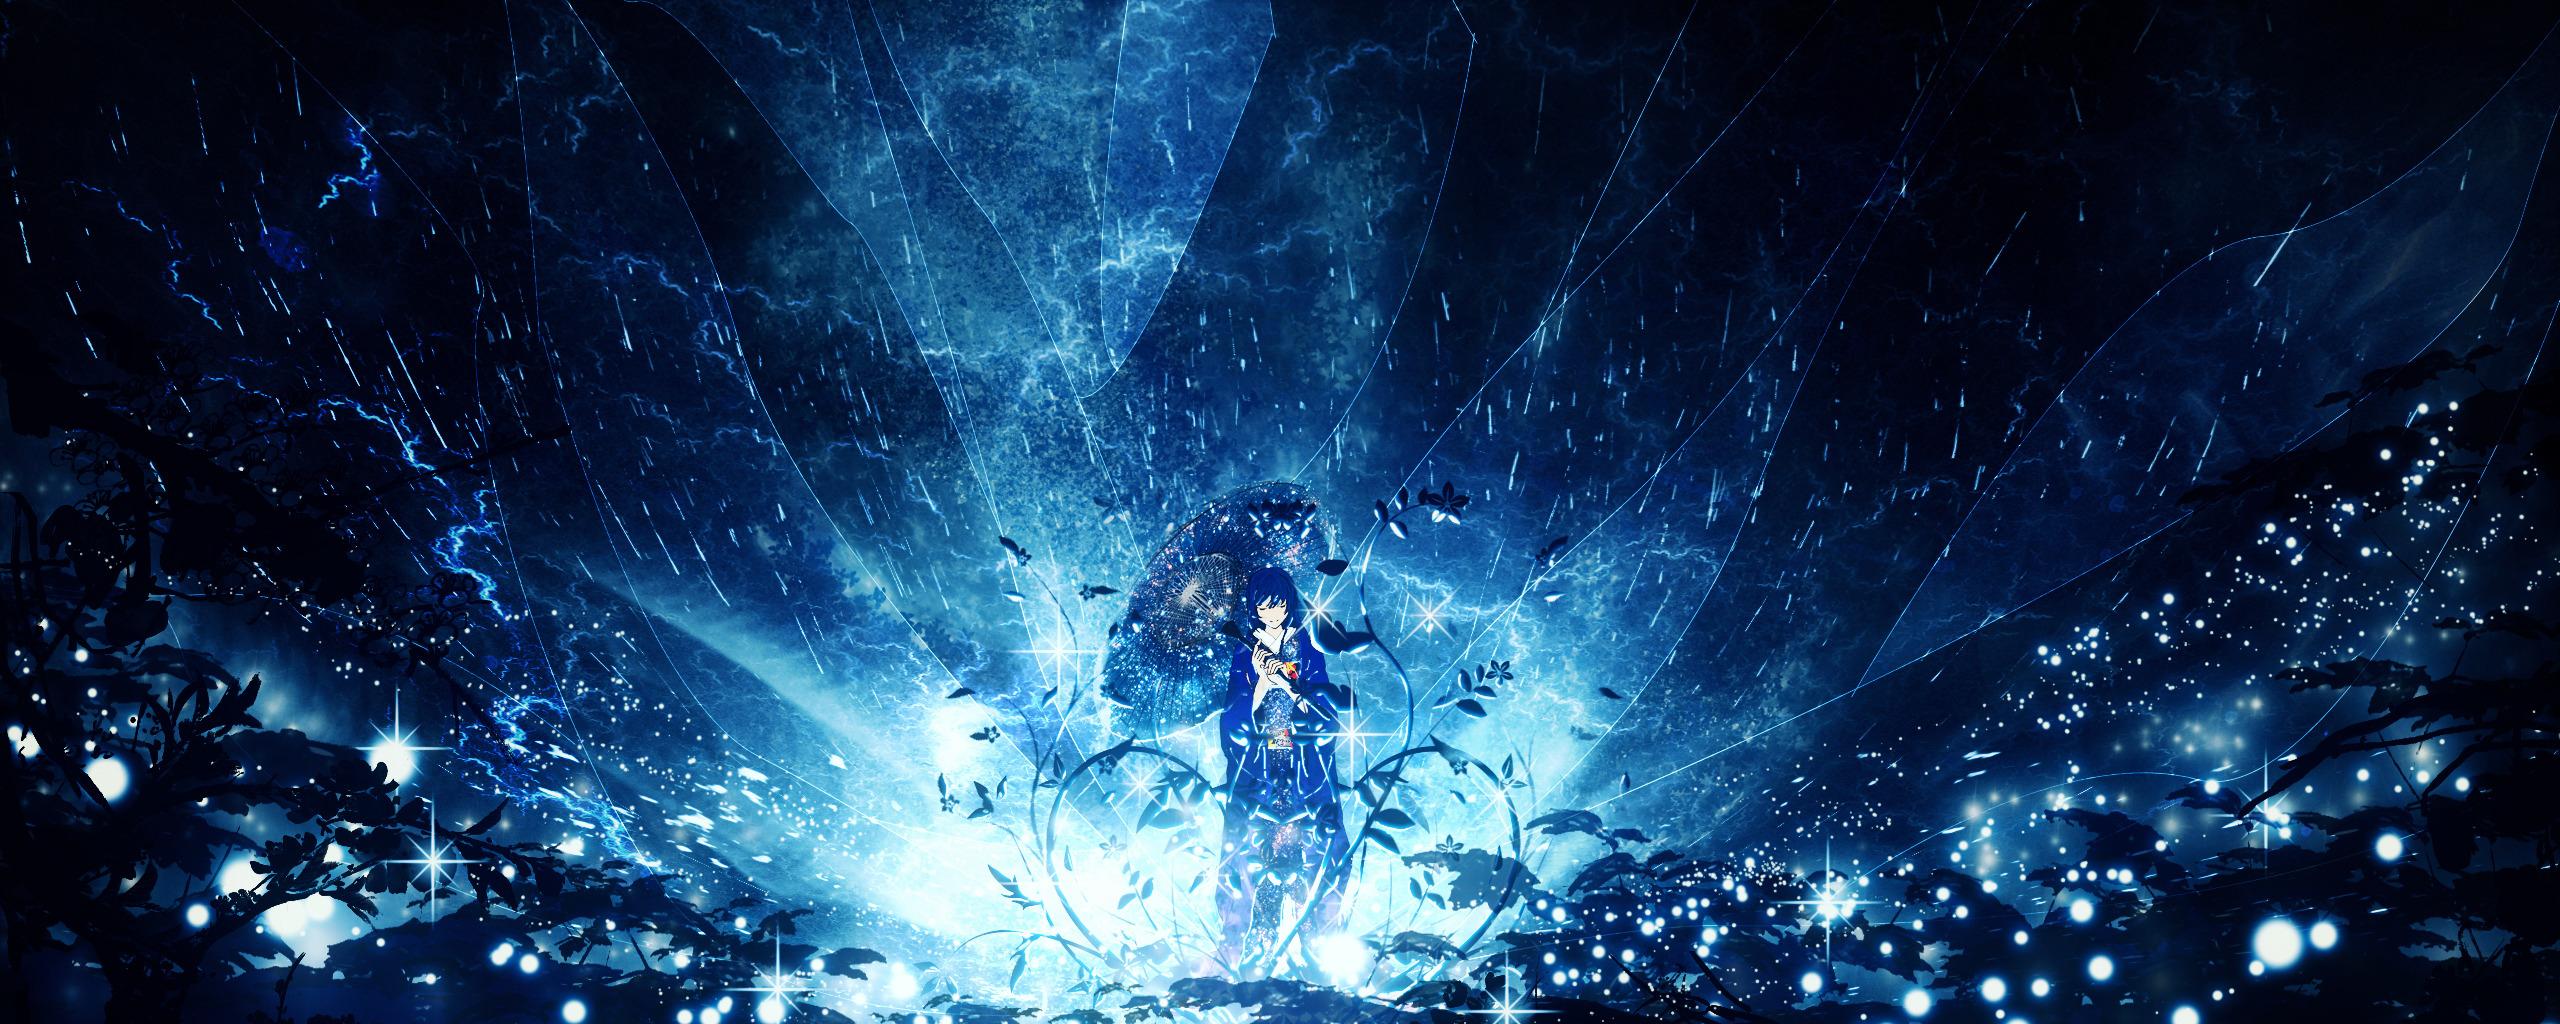 anime girl, outdoor, night, original, 2560x1024 wallpaper